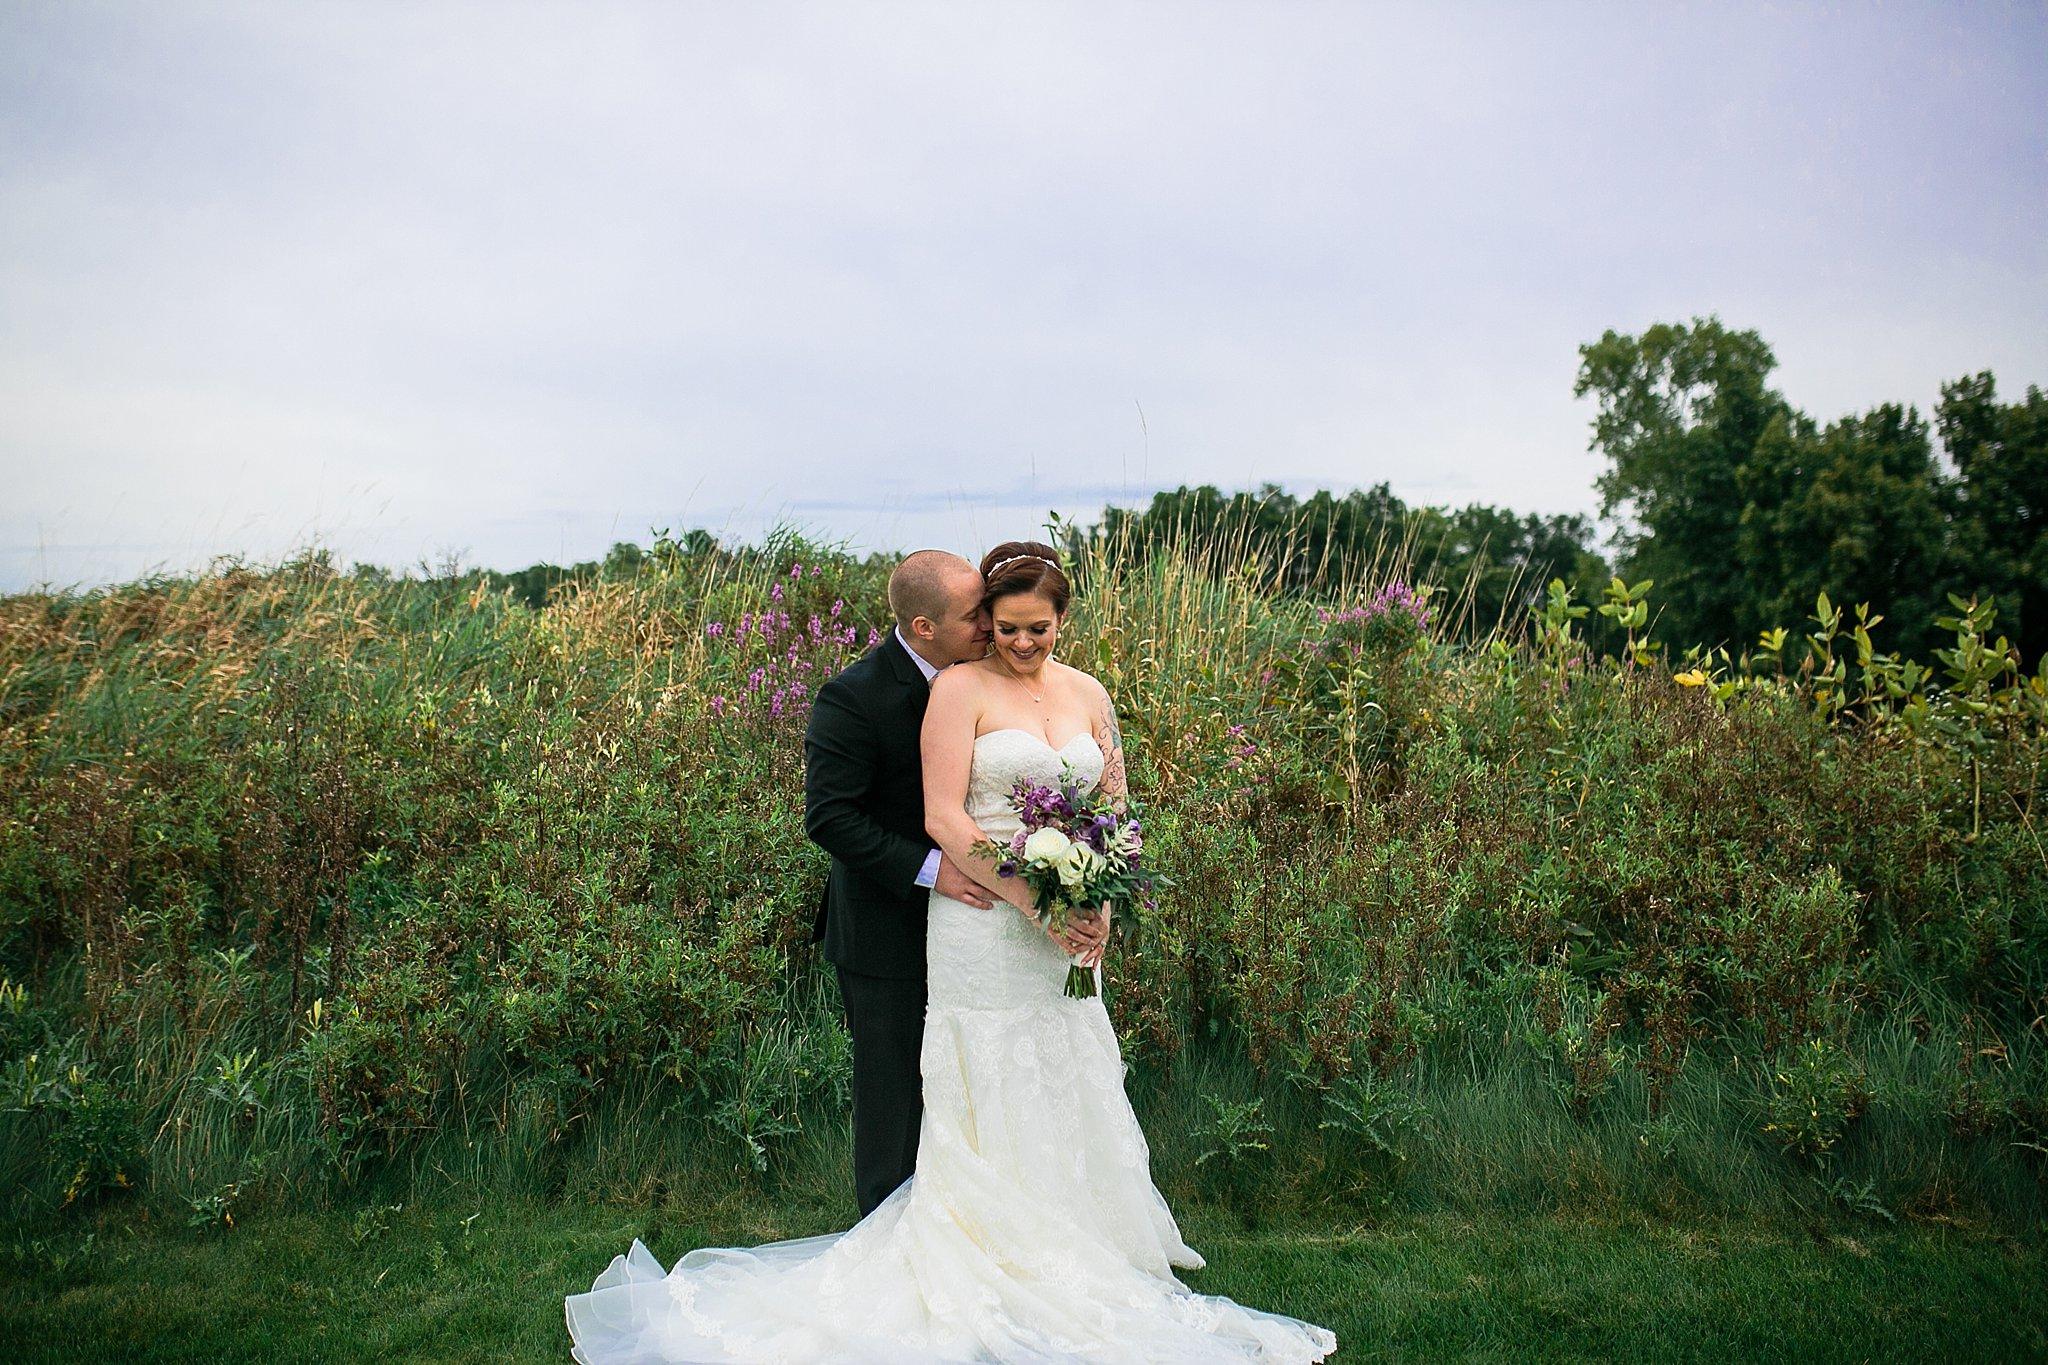 Links at Unionvale Wedding Lagrangeville Wedding Hudson Valley Wedding Photographer Sweet Alice Photography53.jpg